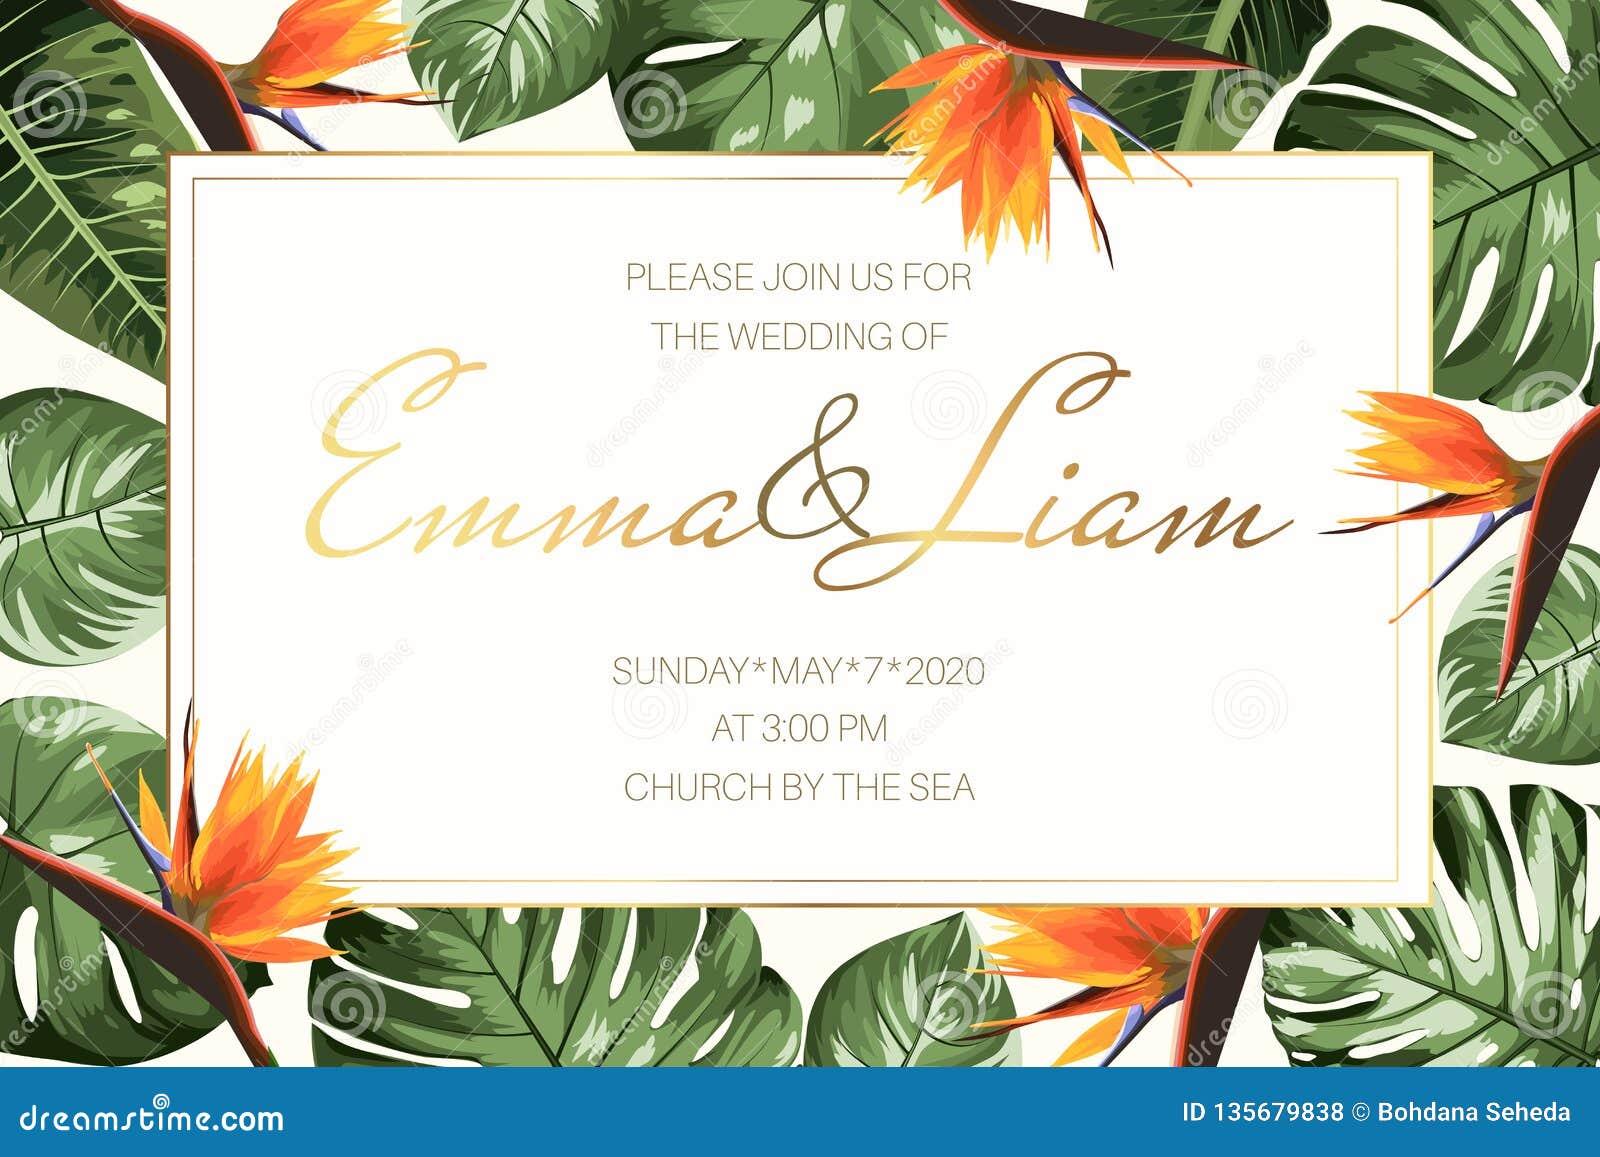 Rsvp Card Template   Wedding Event Invitation Rsvp Card Template Green Monstera